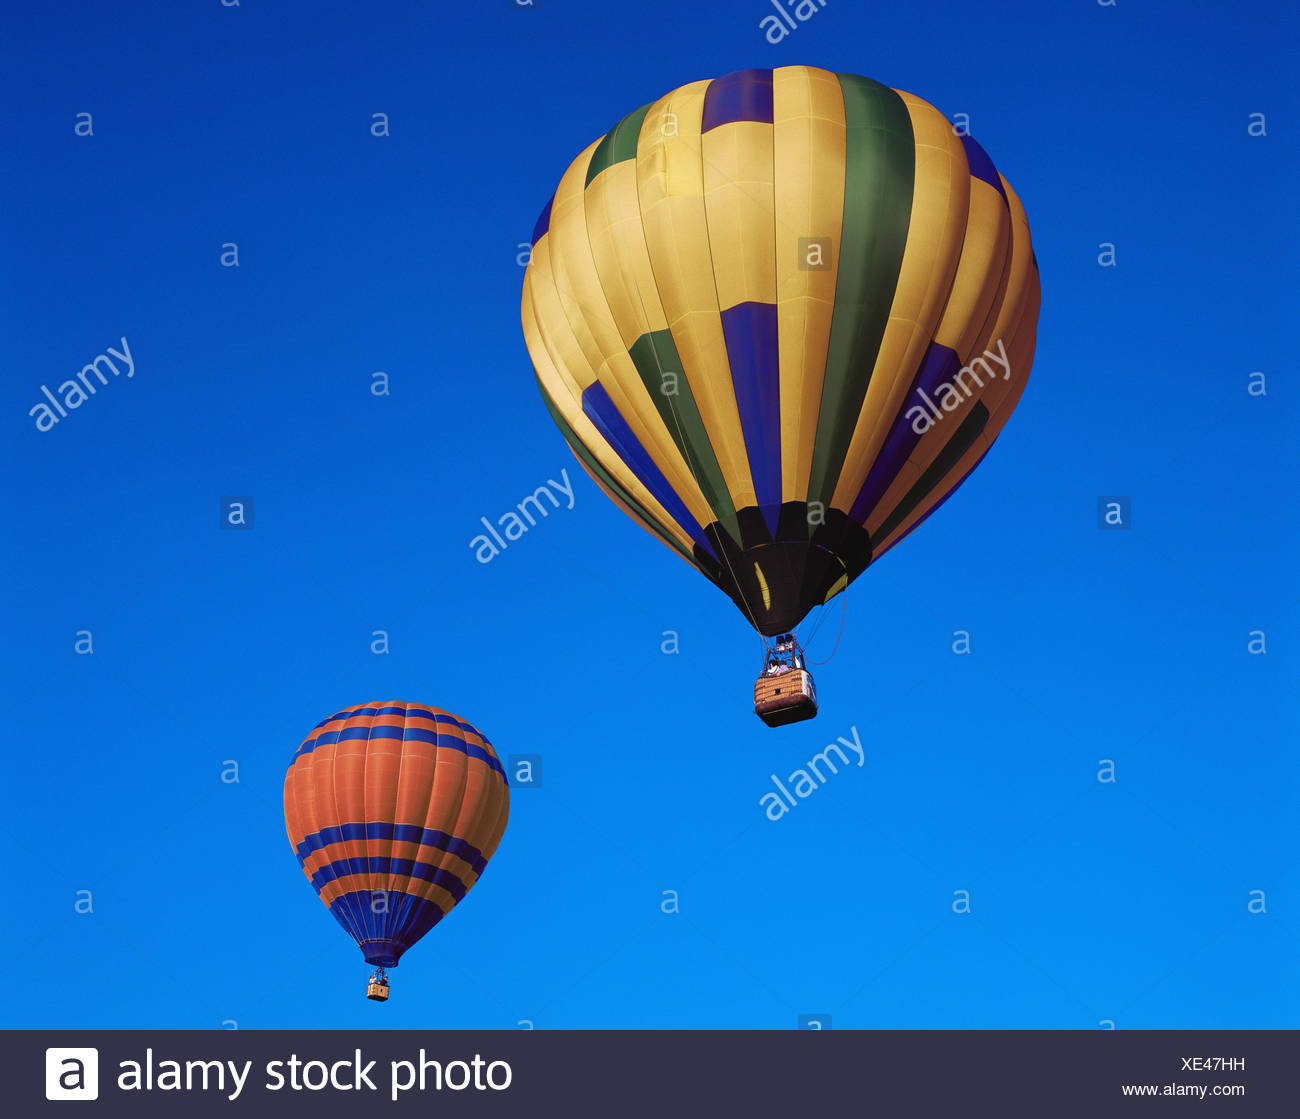 Palloni Ad Aria Calda.I Palloni Ad Aria Calda Foto Immagine Stock 284064861 Alamy